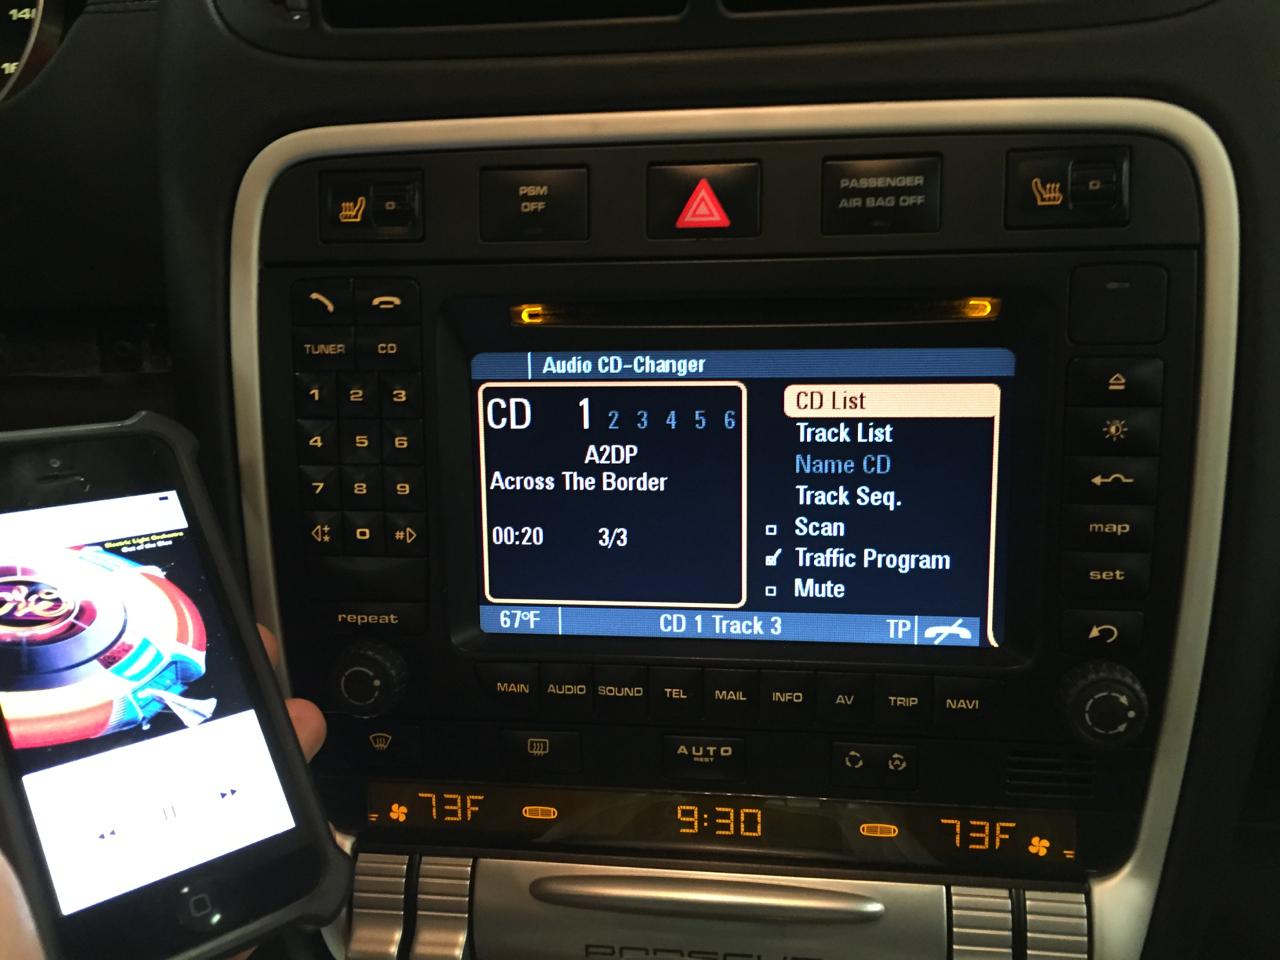 Porsche Cayenne - Remote Car Starter and Bluetooth - Car ...